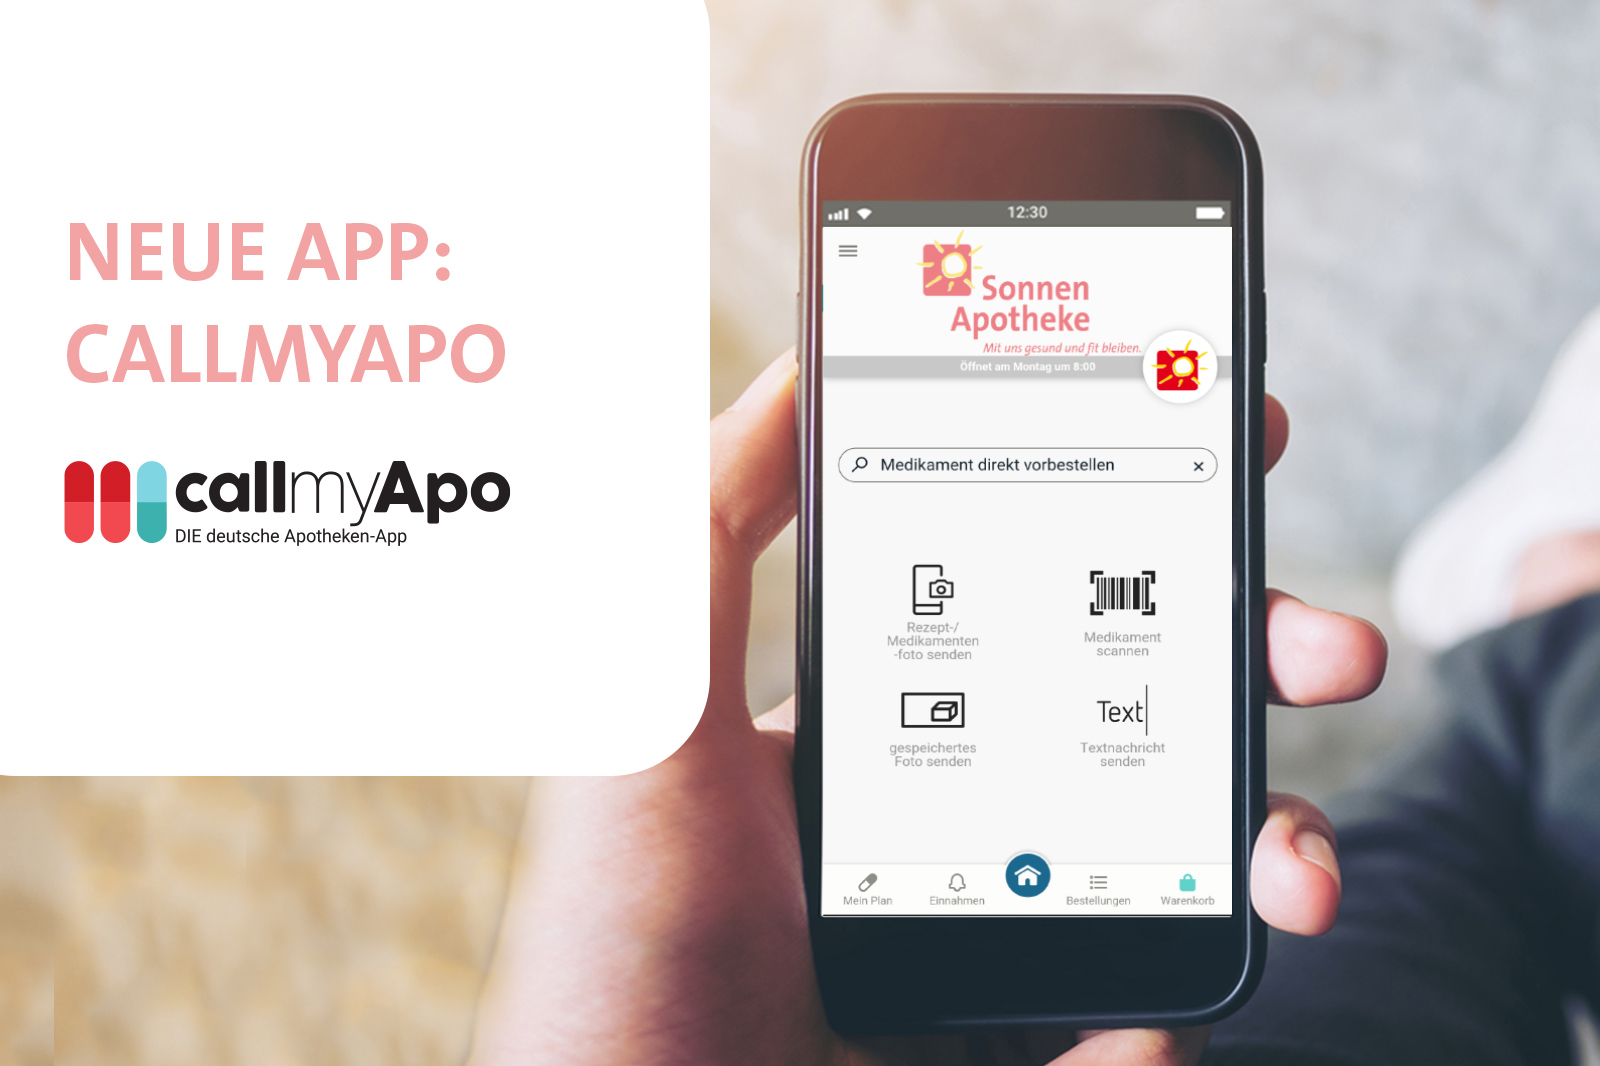 Neue App callmyApo